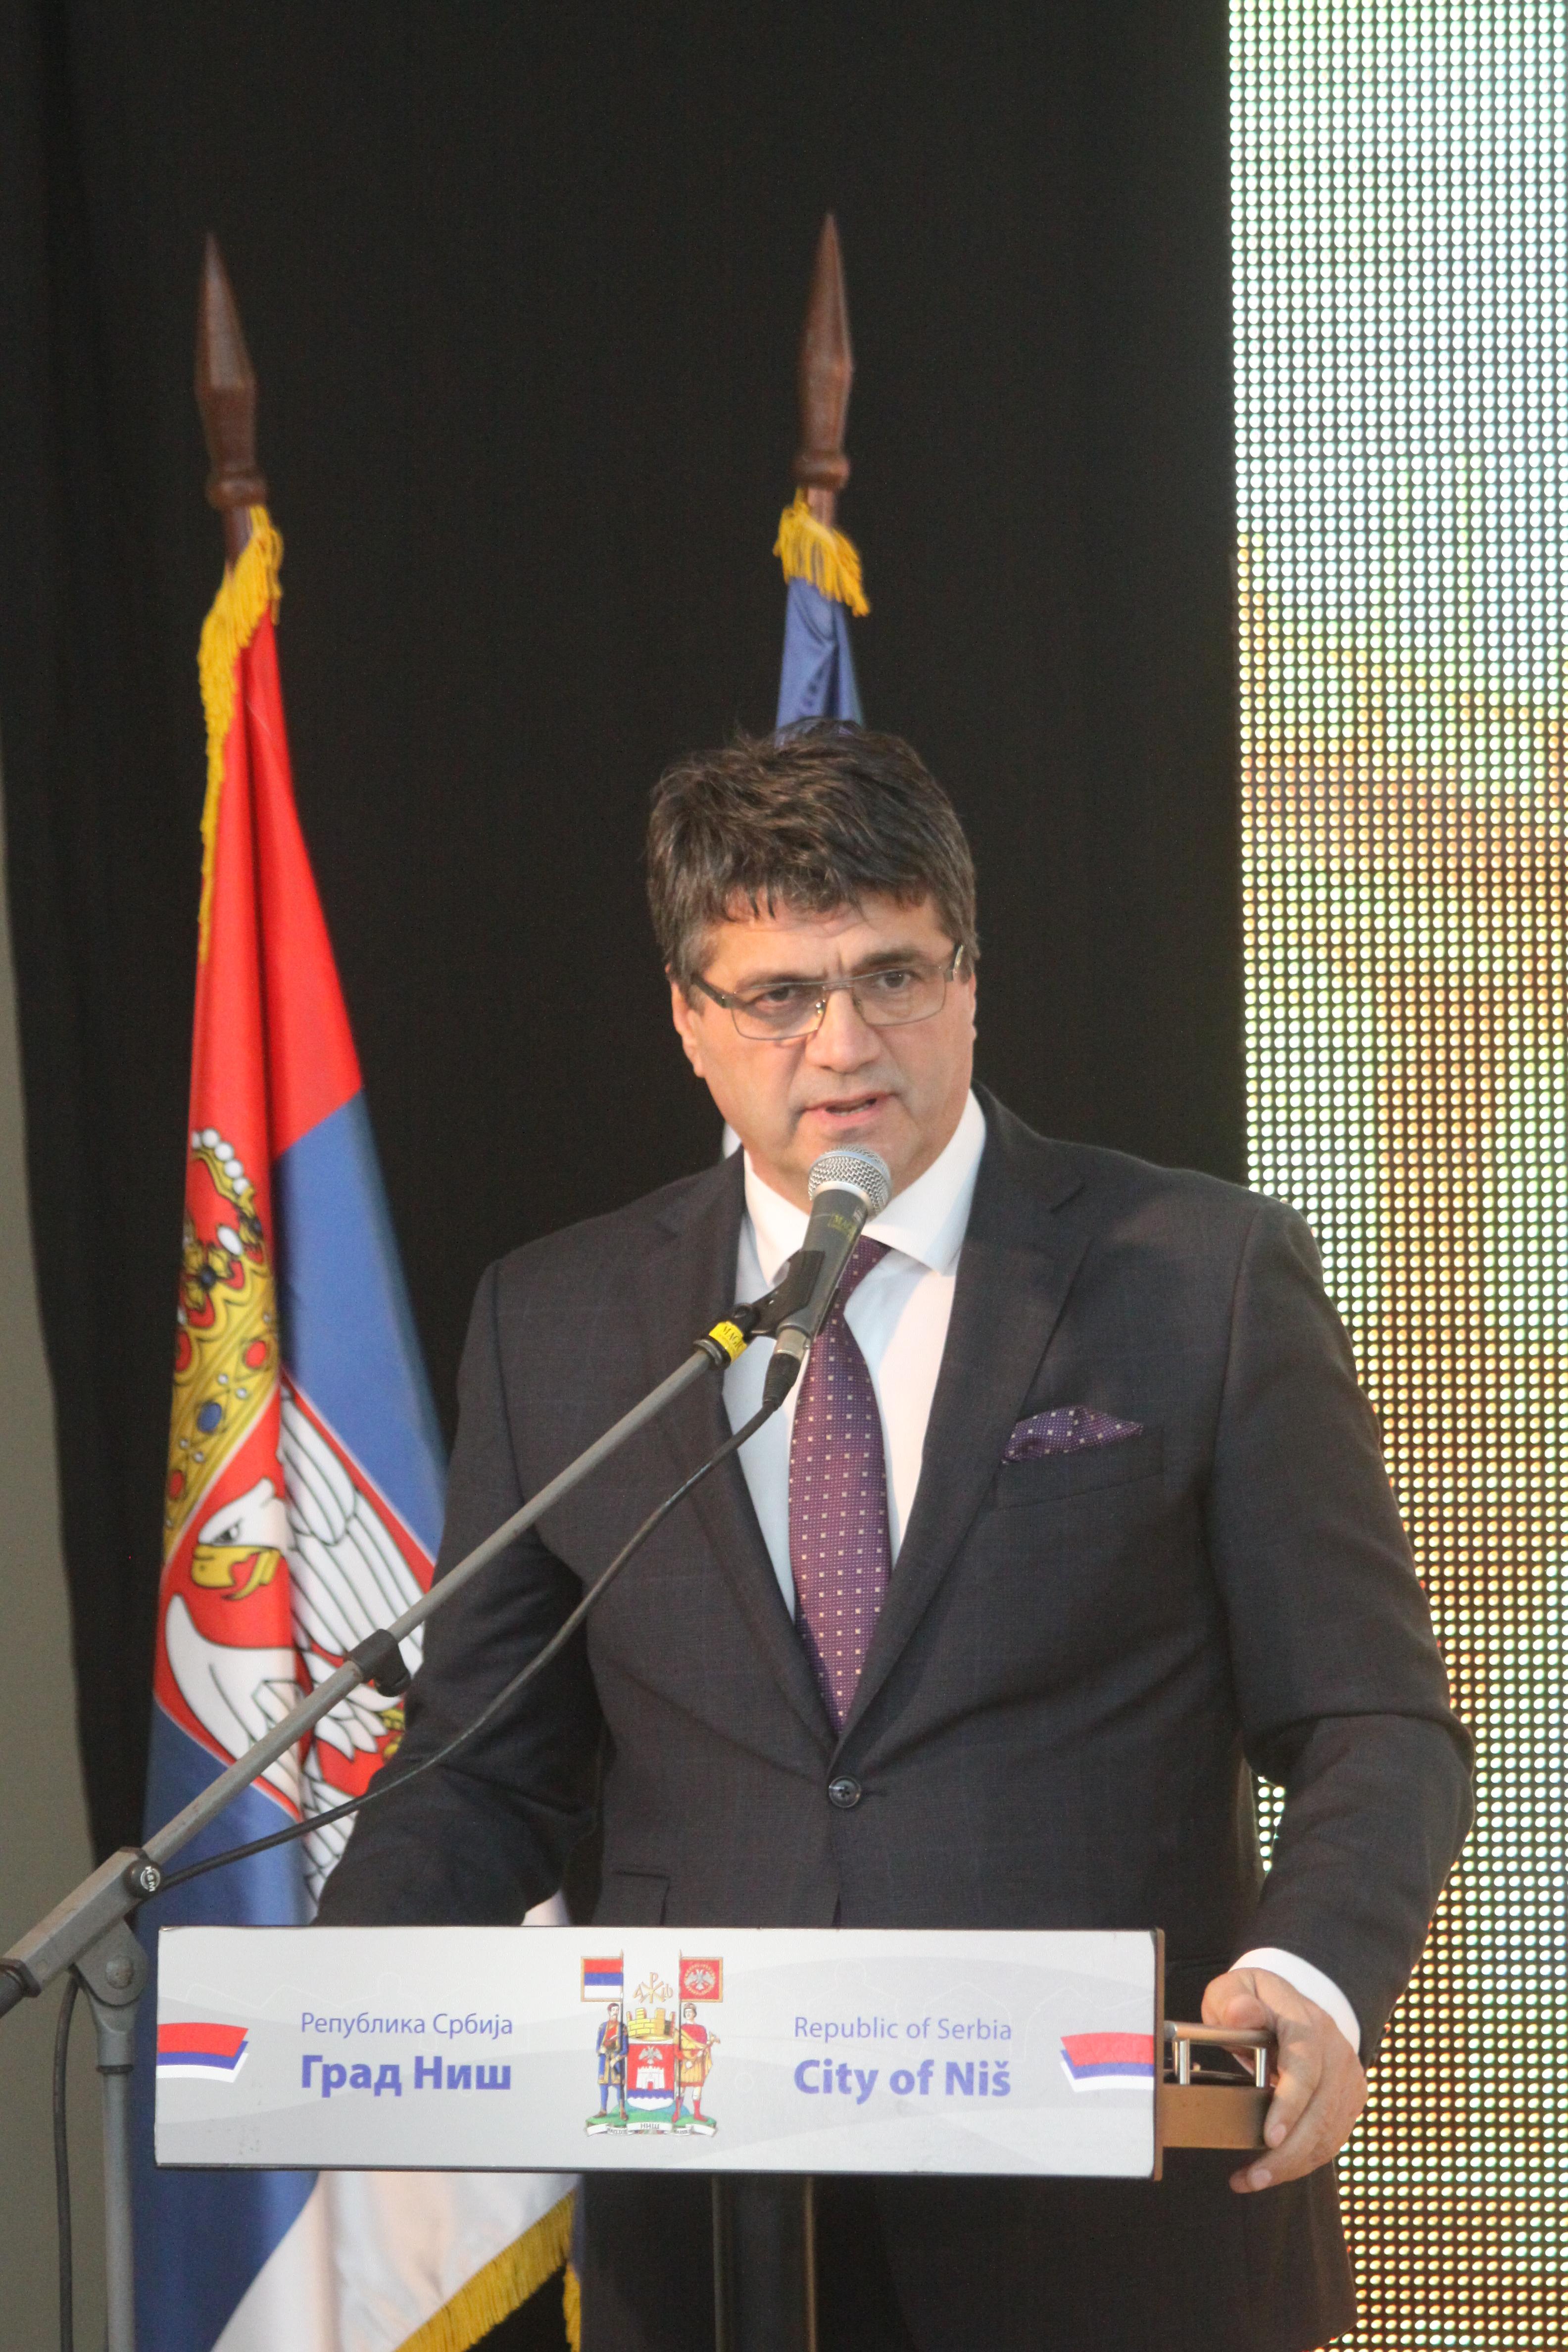 Mayor Darko Bulatovic